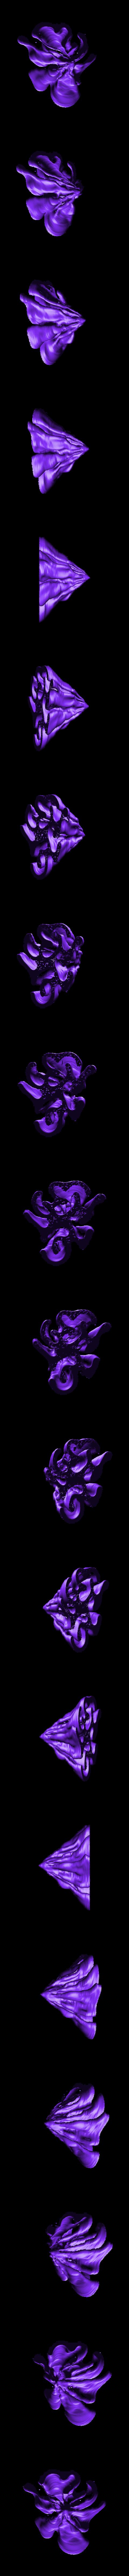 dragonmountain2.stl Download free STL file Weird terrain collection • 3D printer object, ferjerez3d